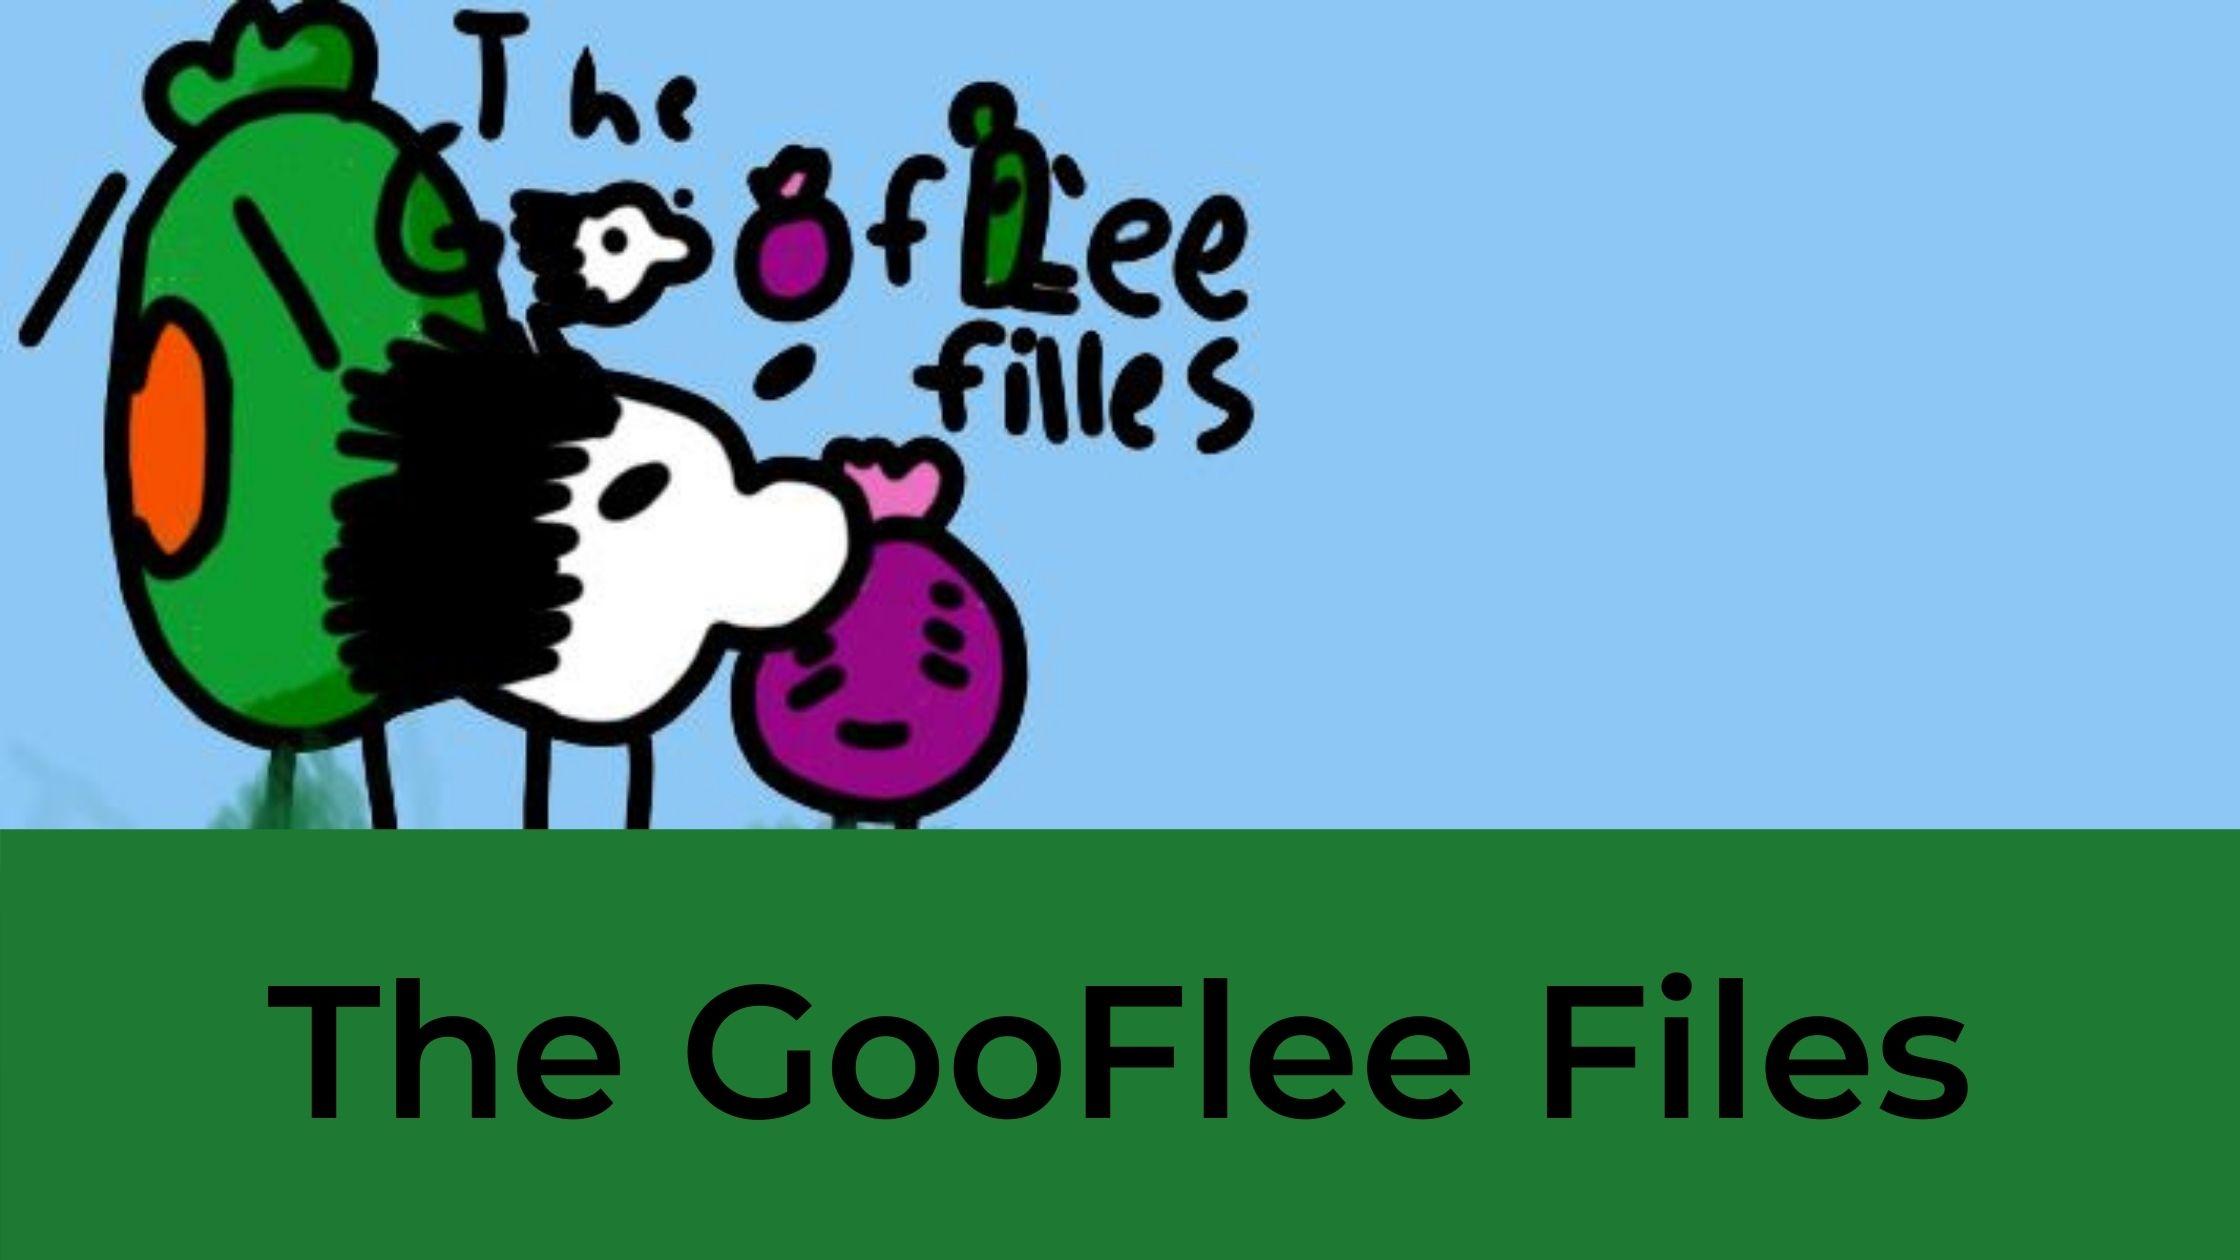 The GooFlee Files